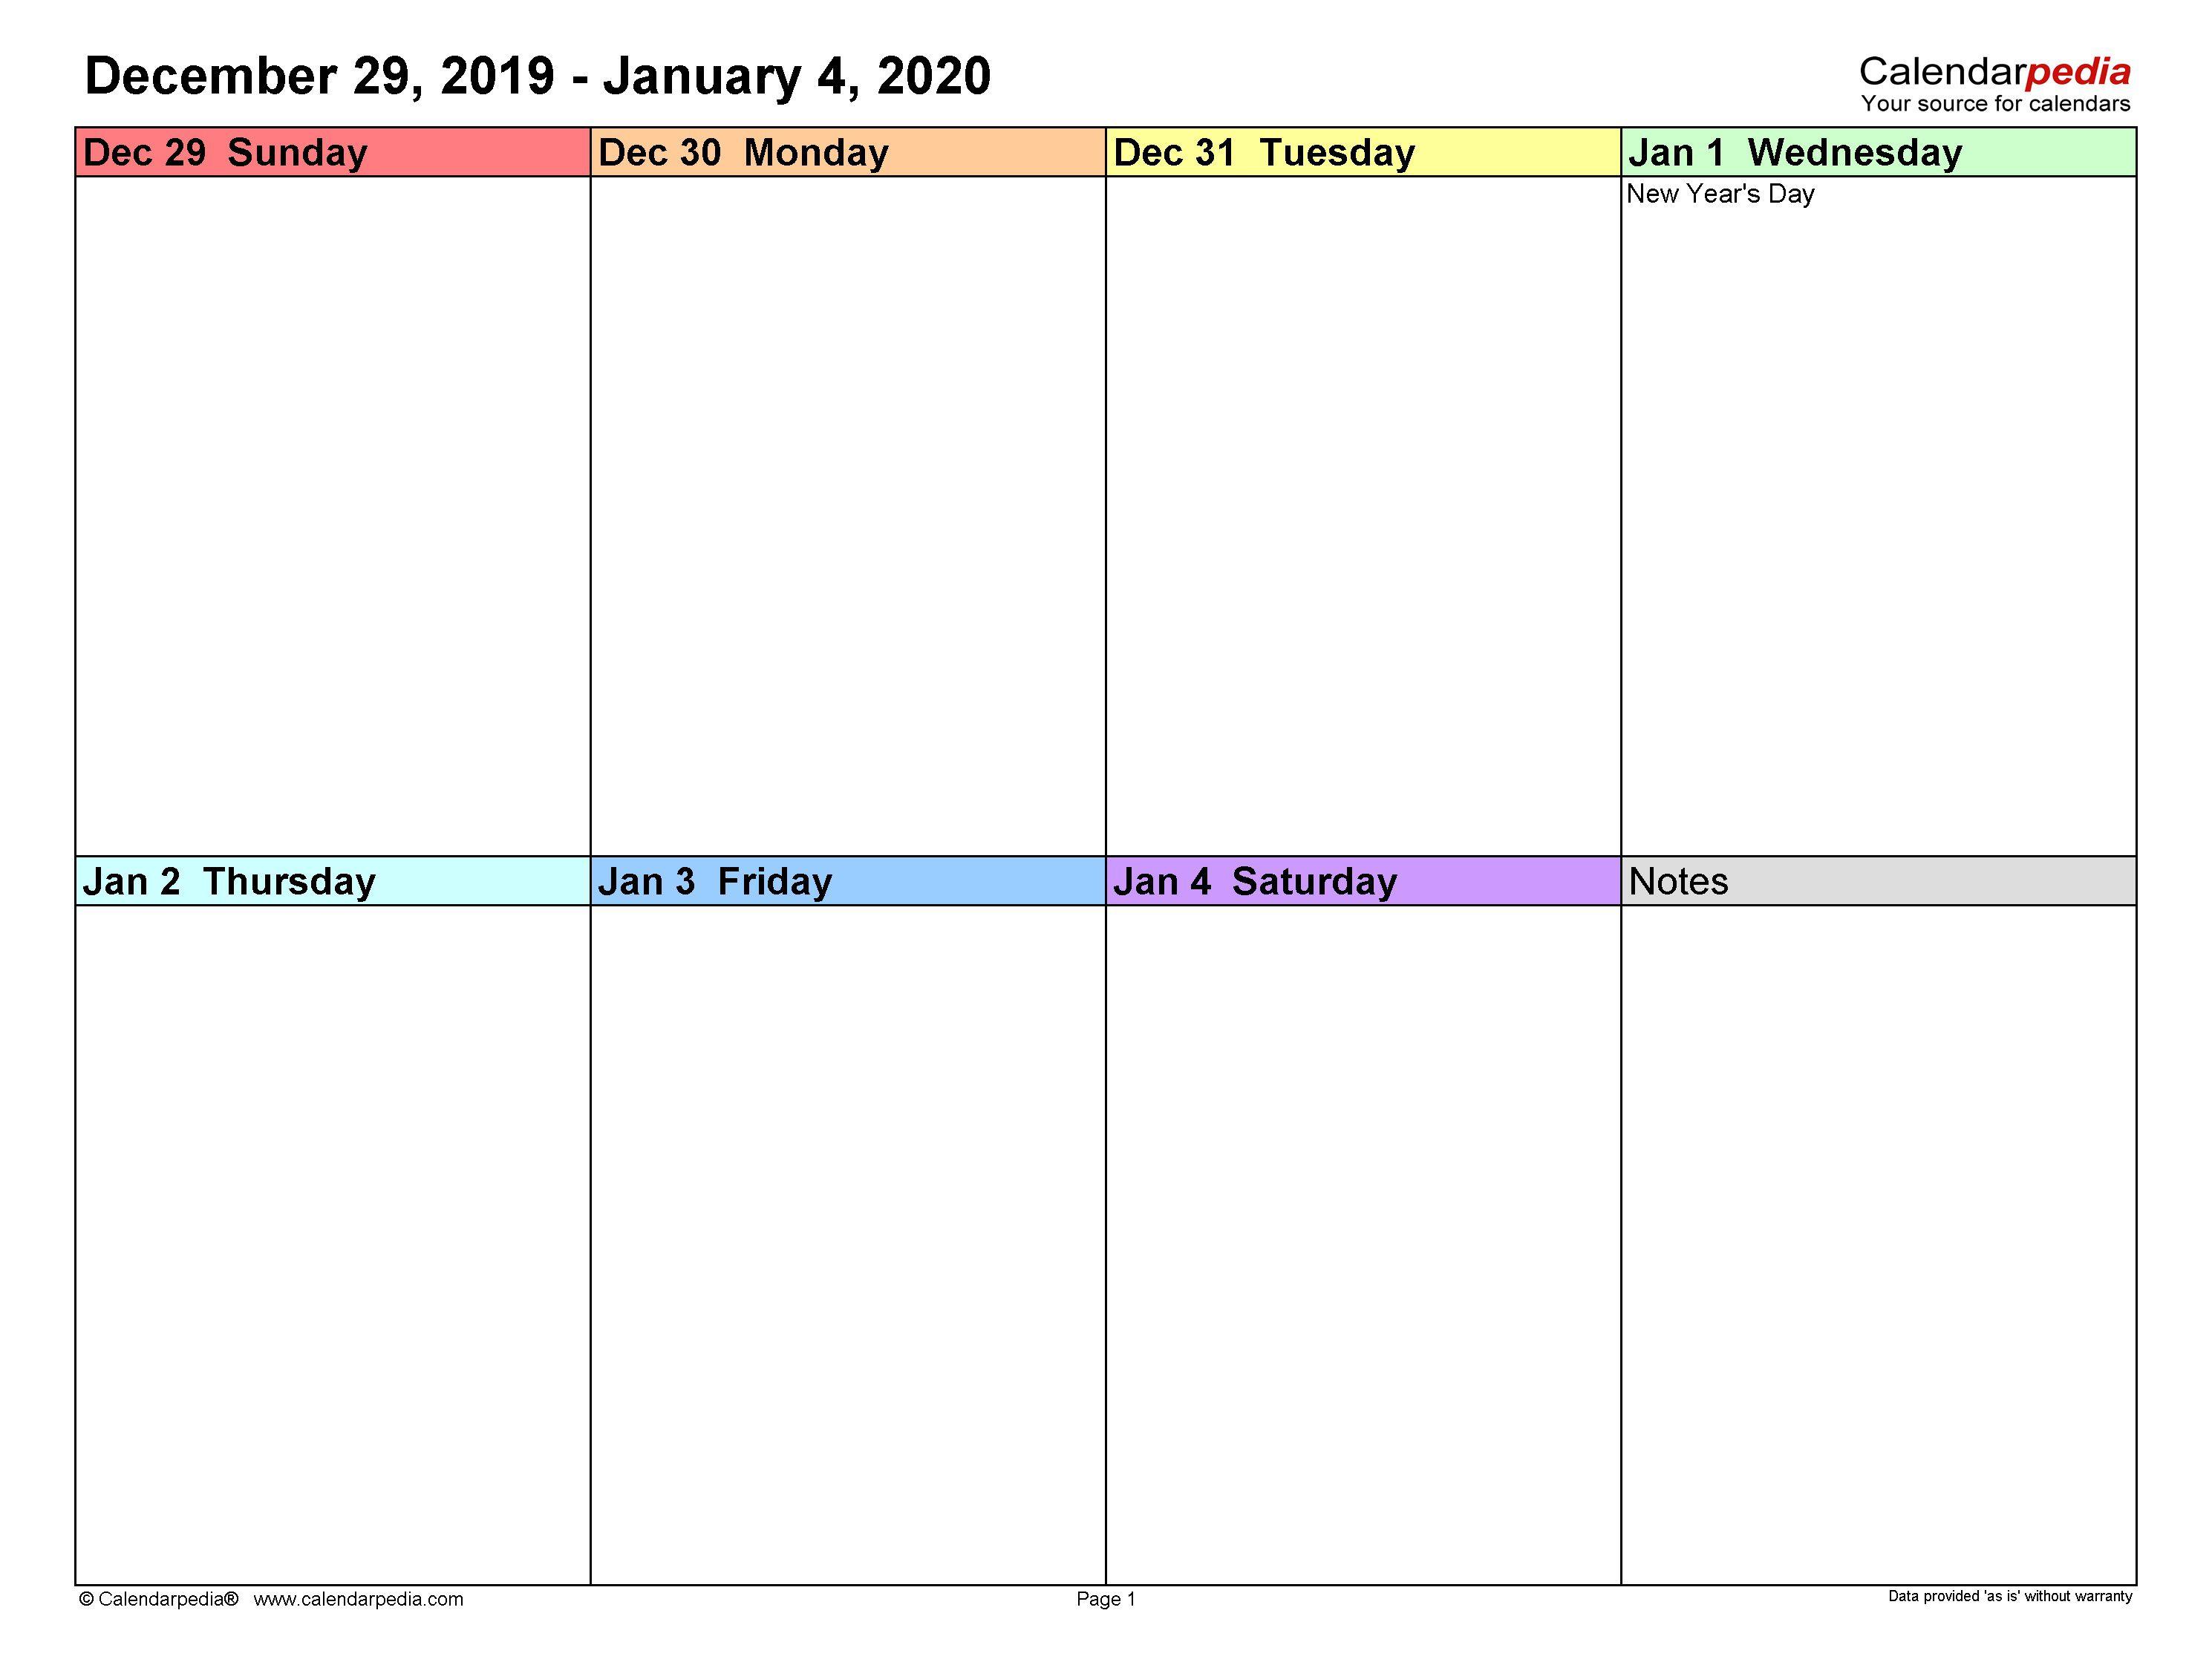 008 Striking Weekly Calendar Template 2020 Highest Clarity  Printable Blank FreeFull